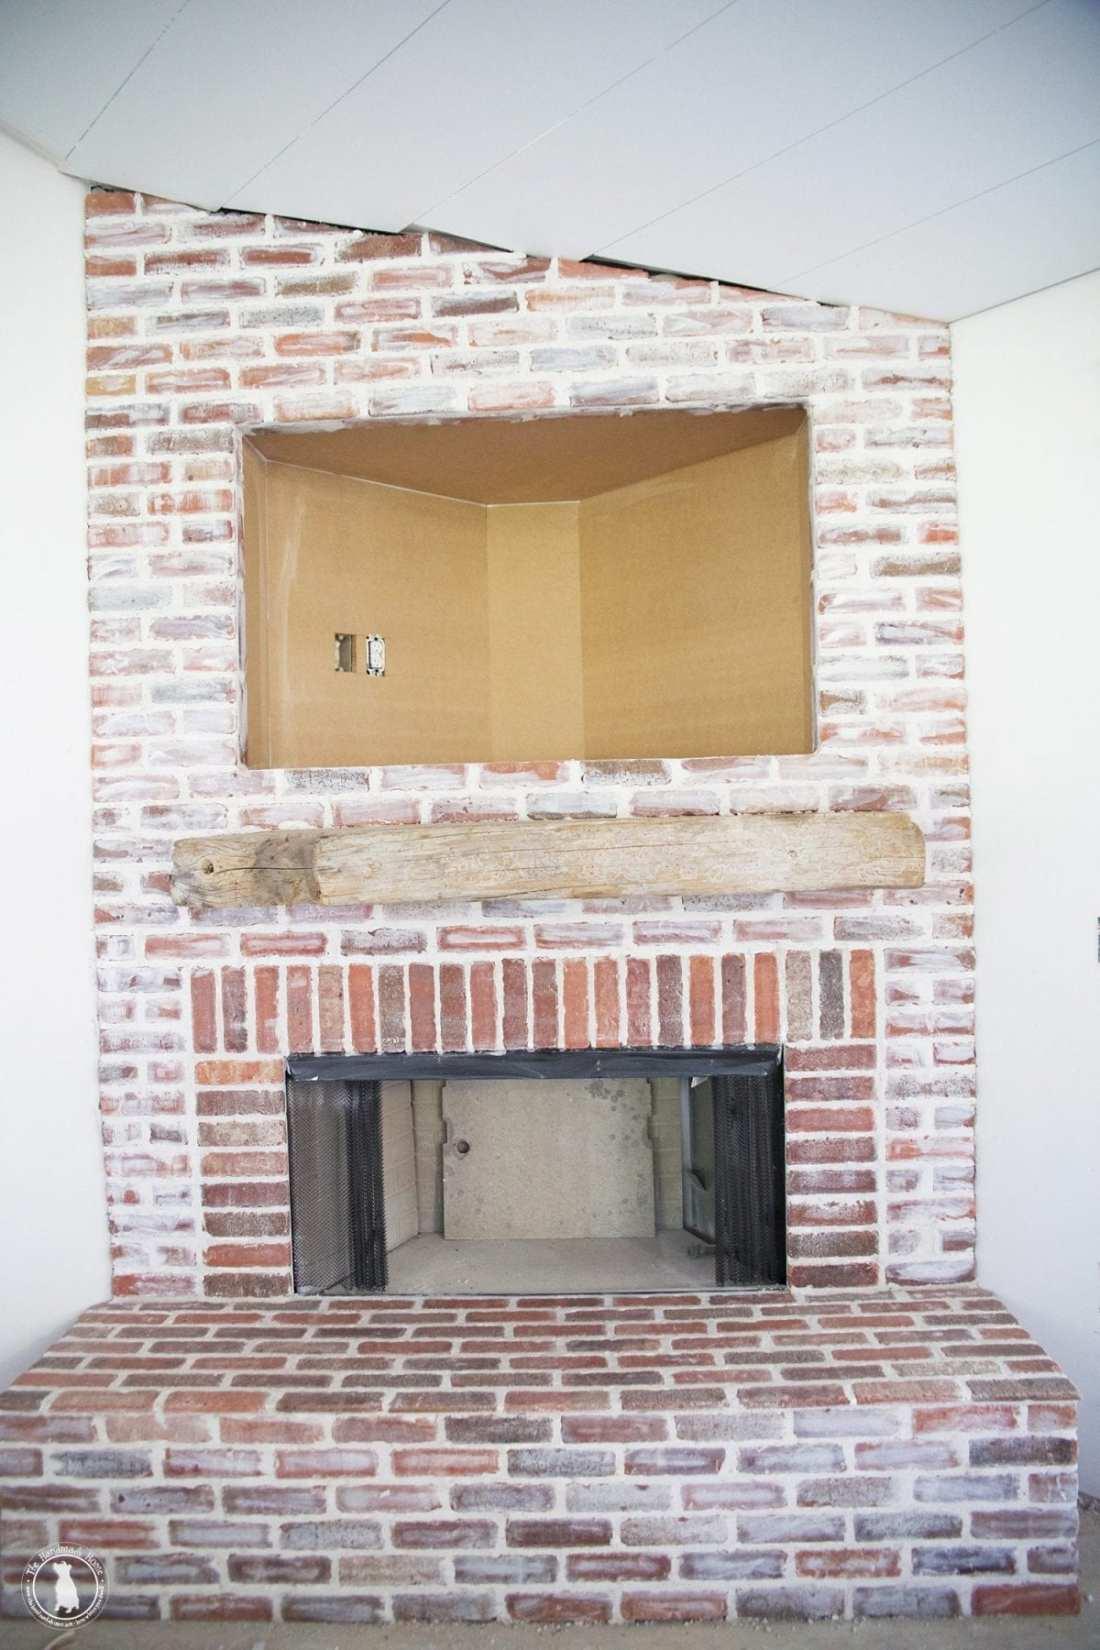 mortar_rub_brick_fireplace